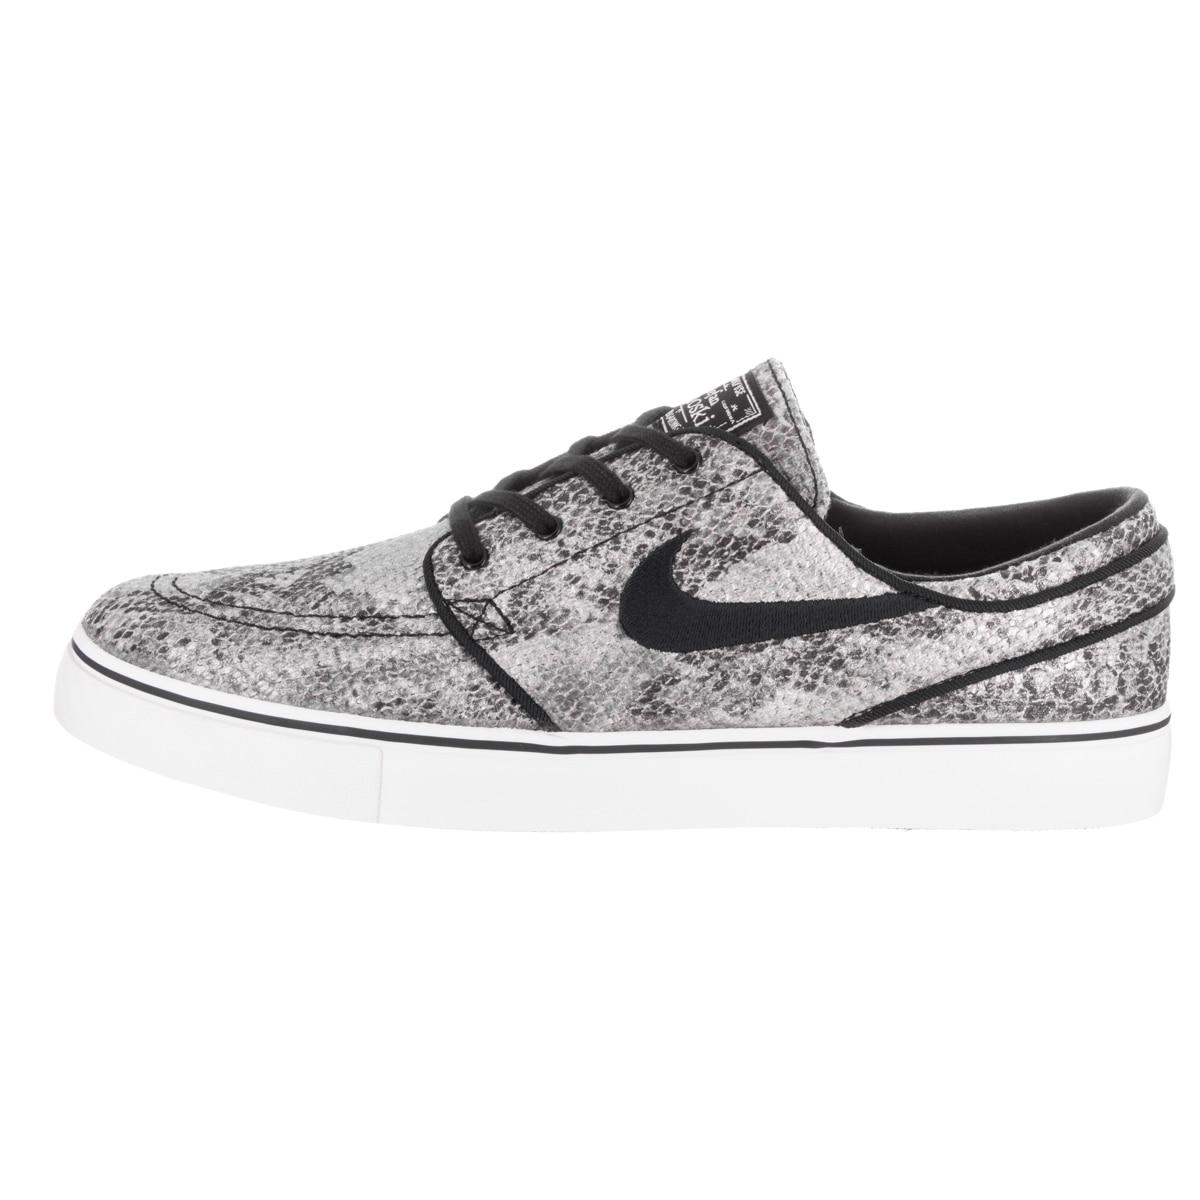 best sneakers 17efb f2730 Shop Nike Men s Zoom Stefan Janoski Prem TxT Black Textile Skate Shoes -  Free Shipping Today - Overstock - 13478118